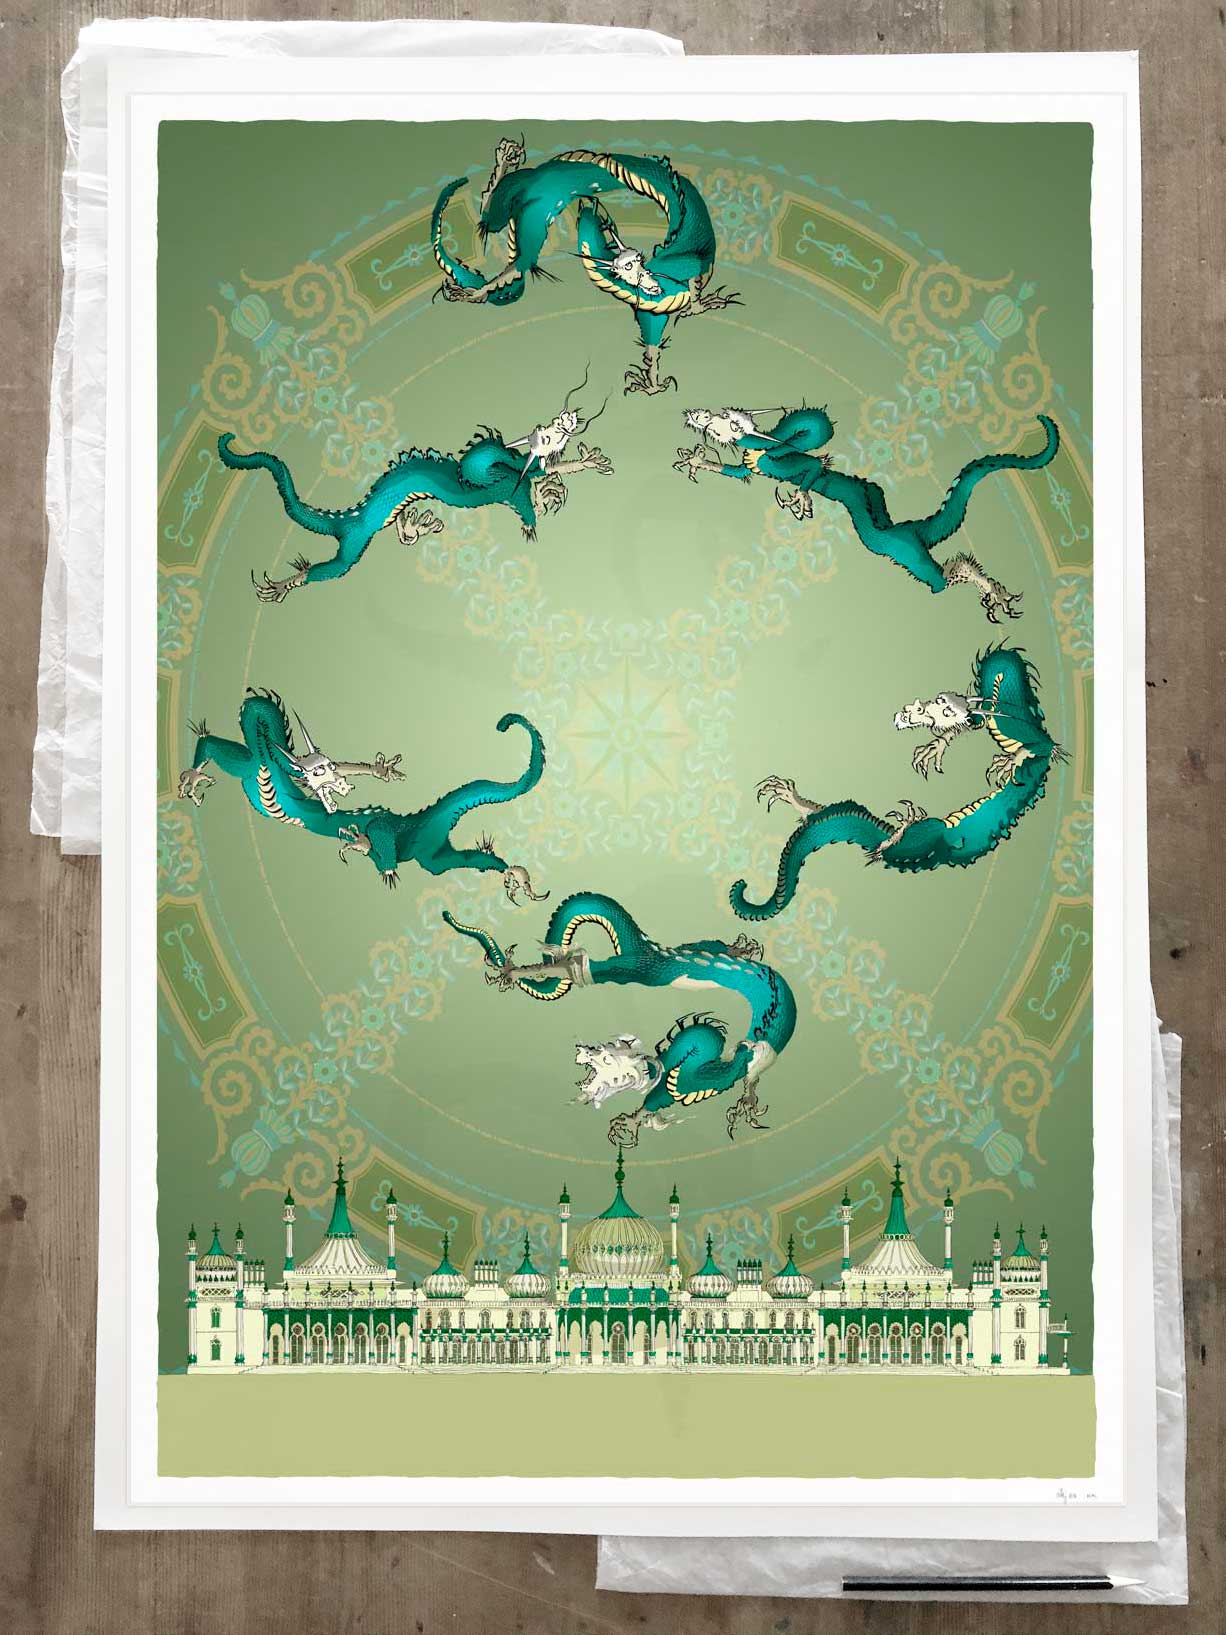 Fine art print by artist alej ez titled Brighton Royal Pavilion Chinoiseriez Arco